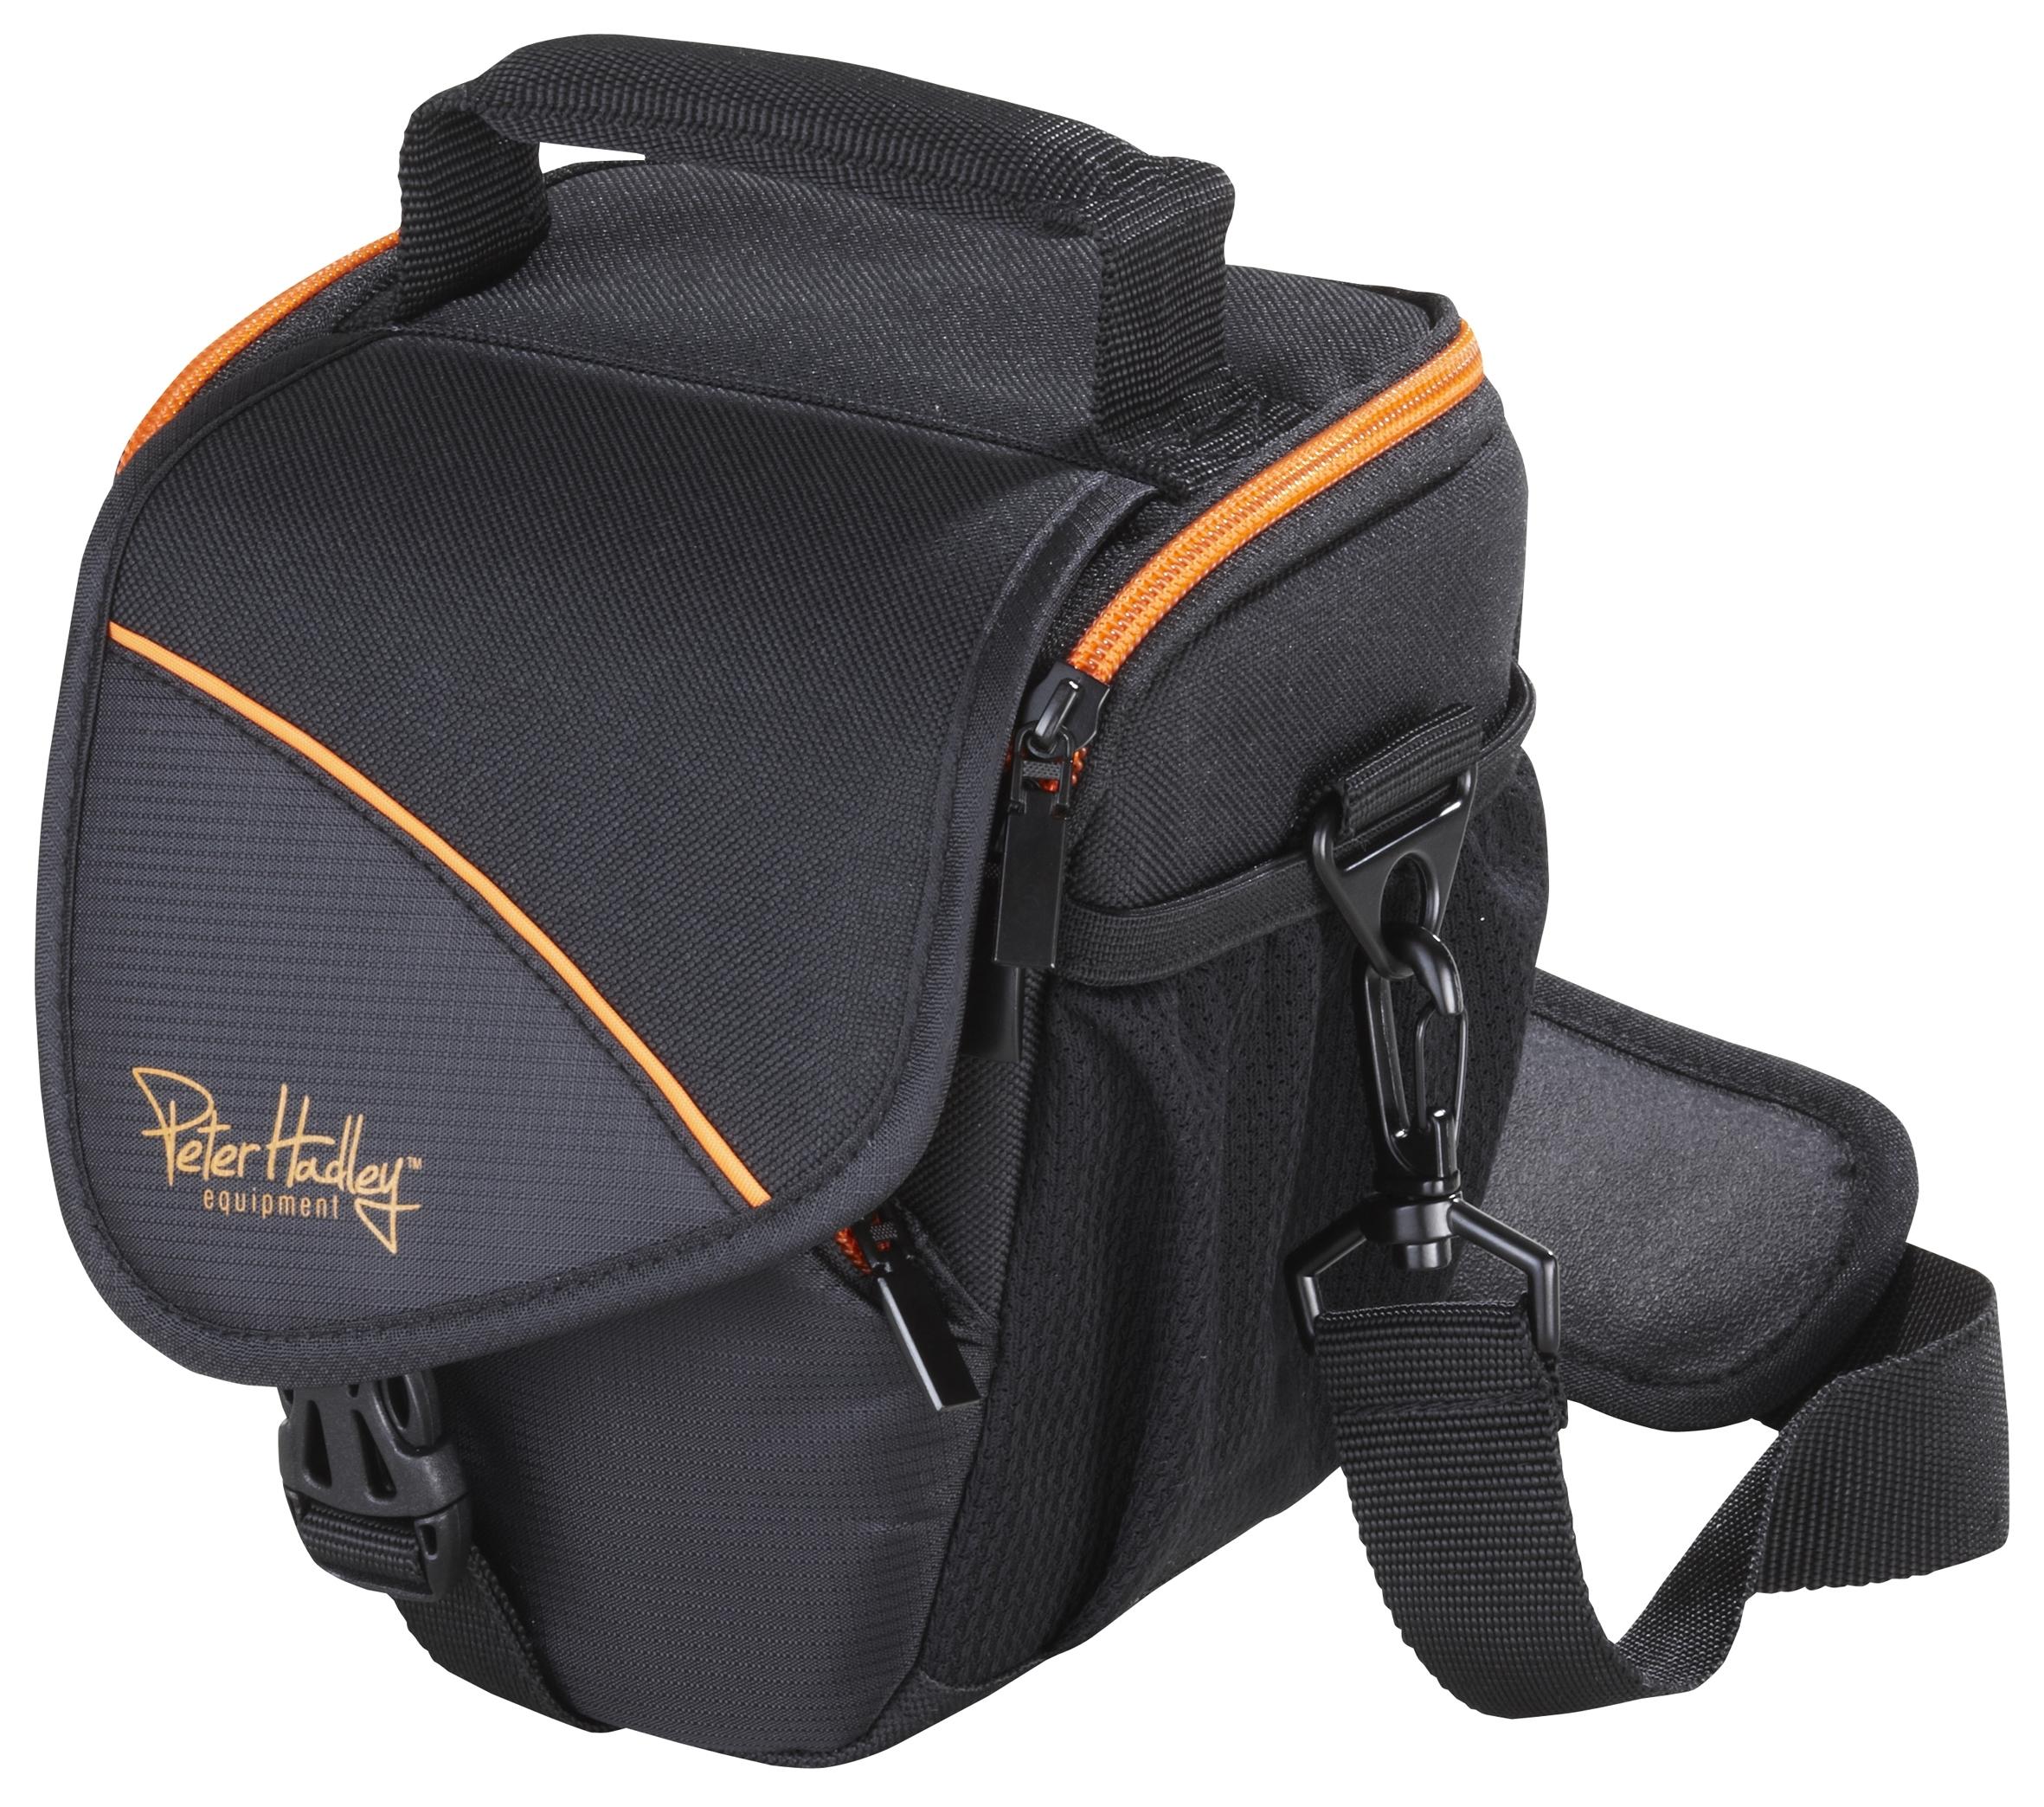 Peter Hadley Las Vegas 70 Colt Black/orange